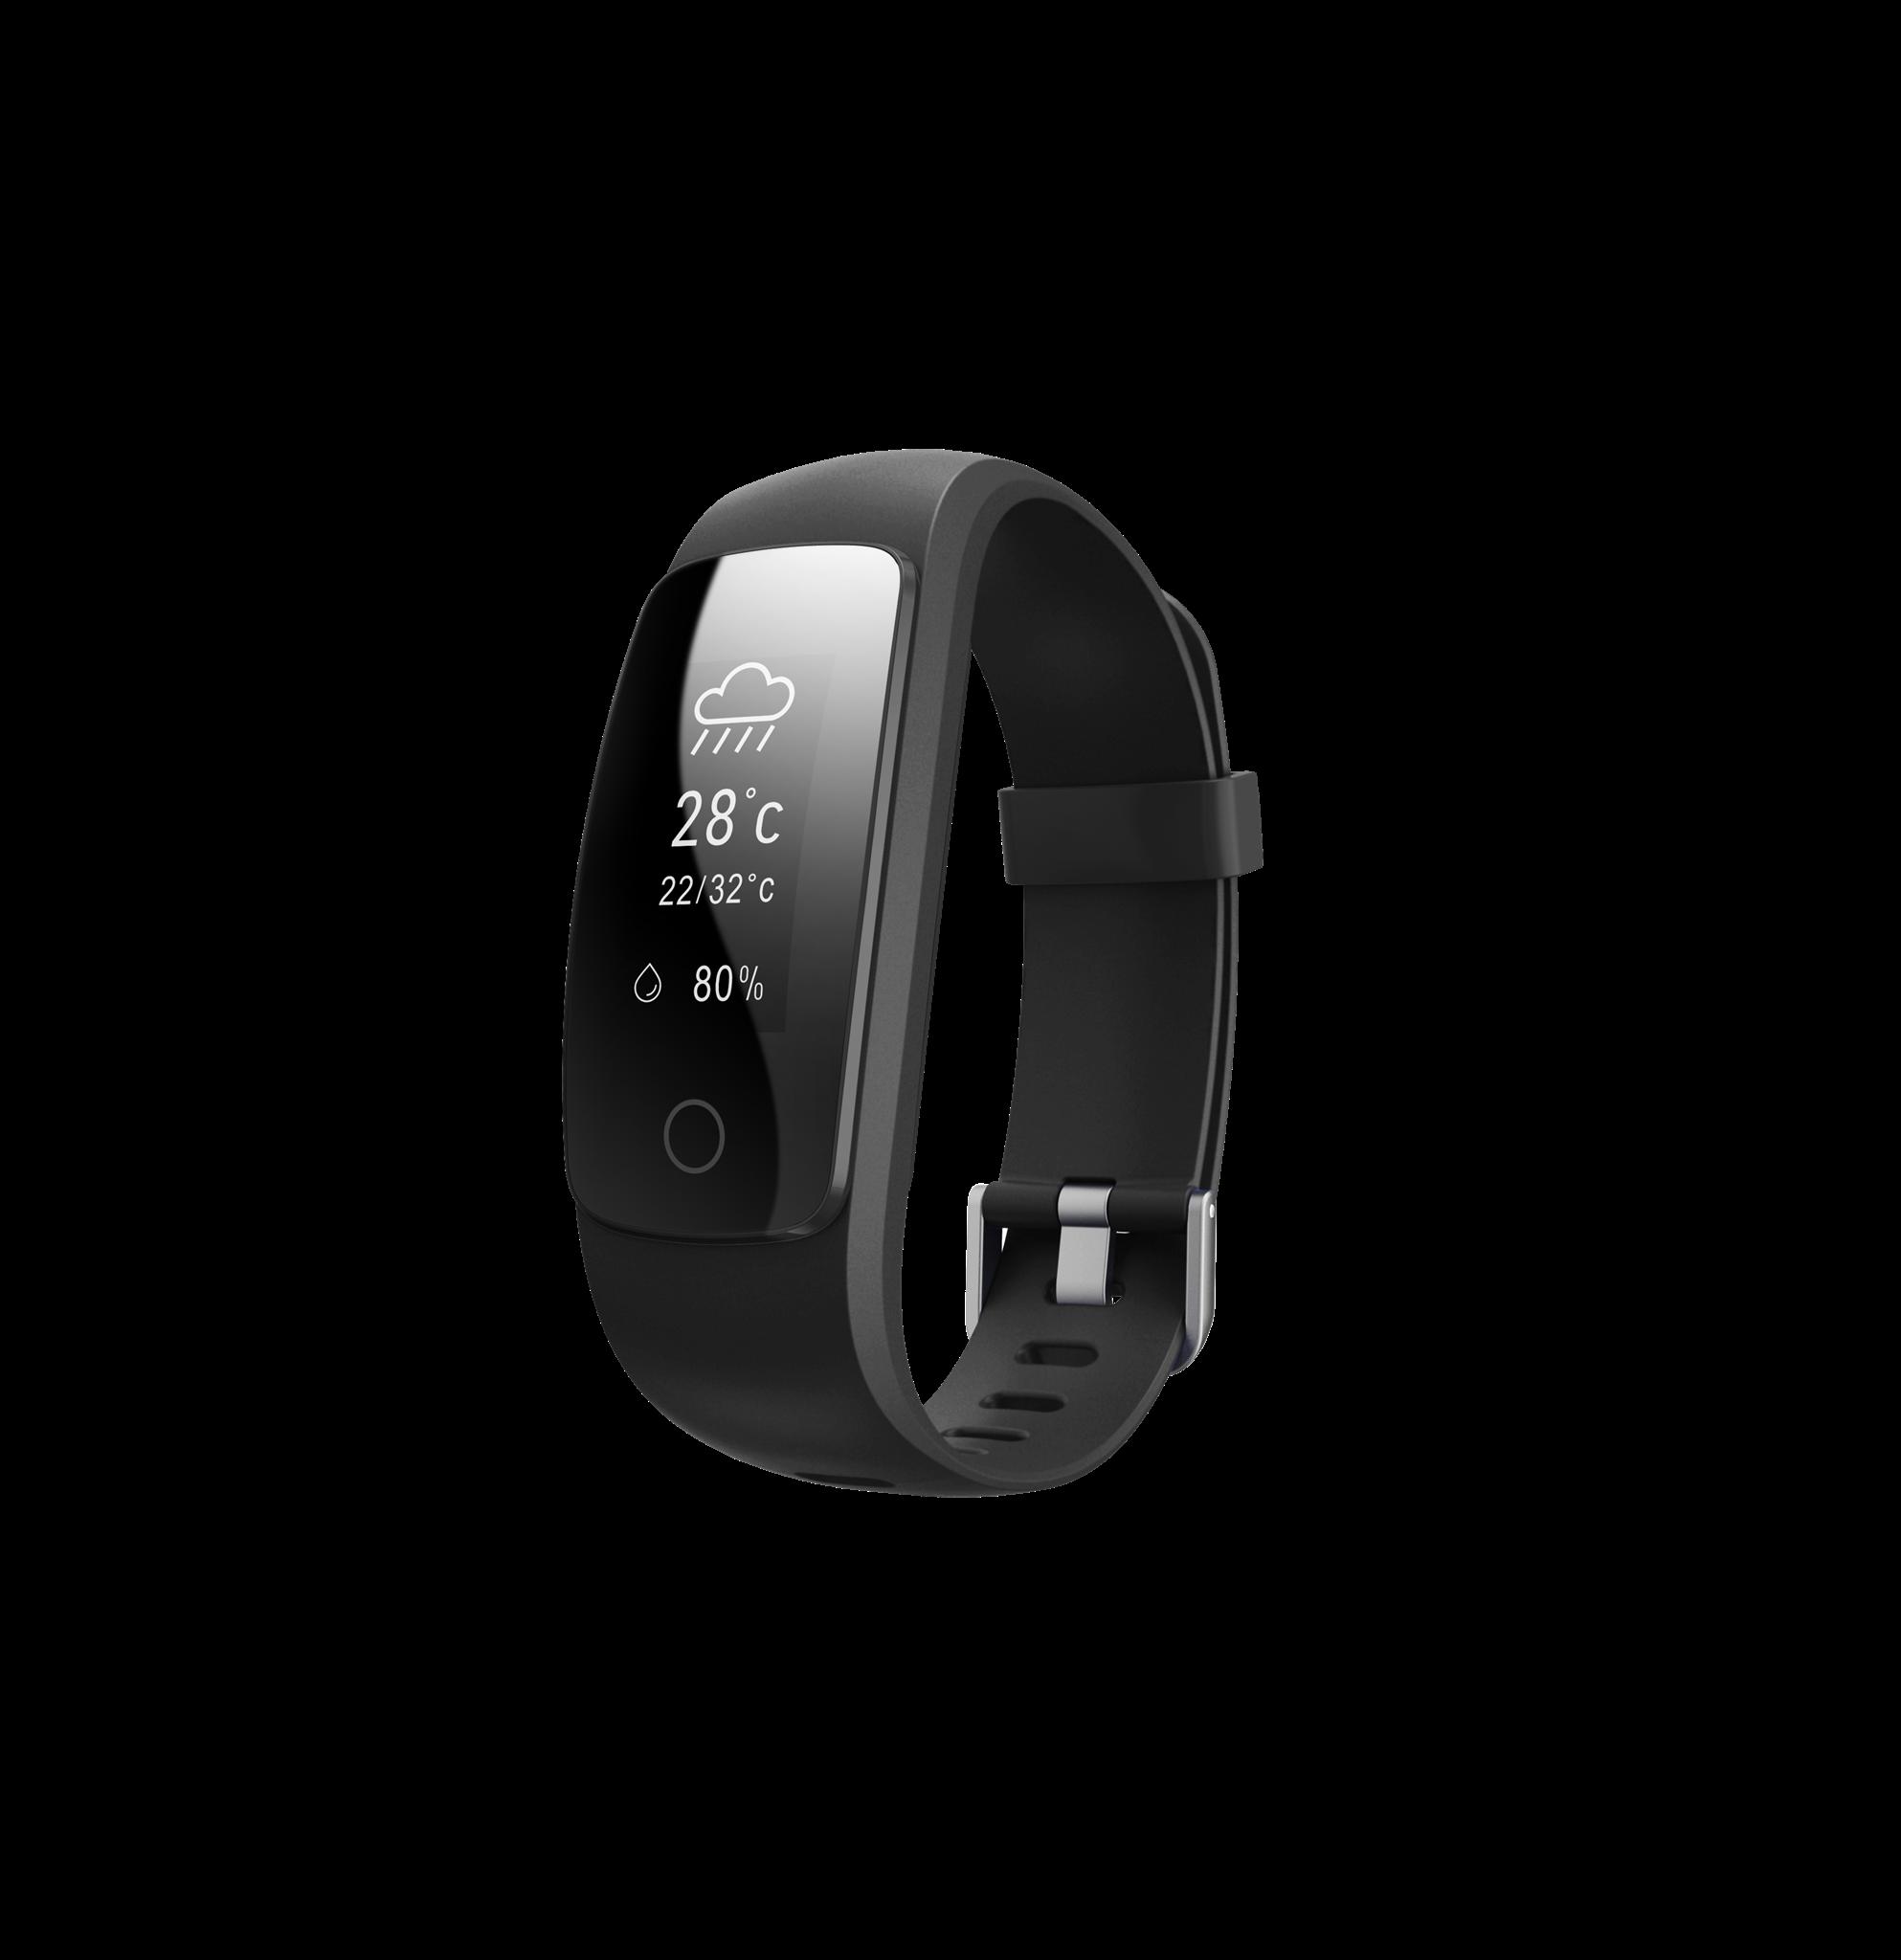 "Use ""HG0340"" : Get 40% off on Hug Elan Multi Sport Fitness Tracker"